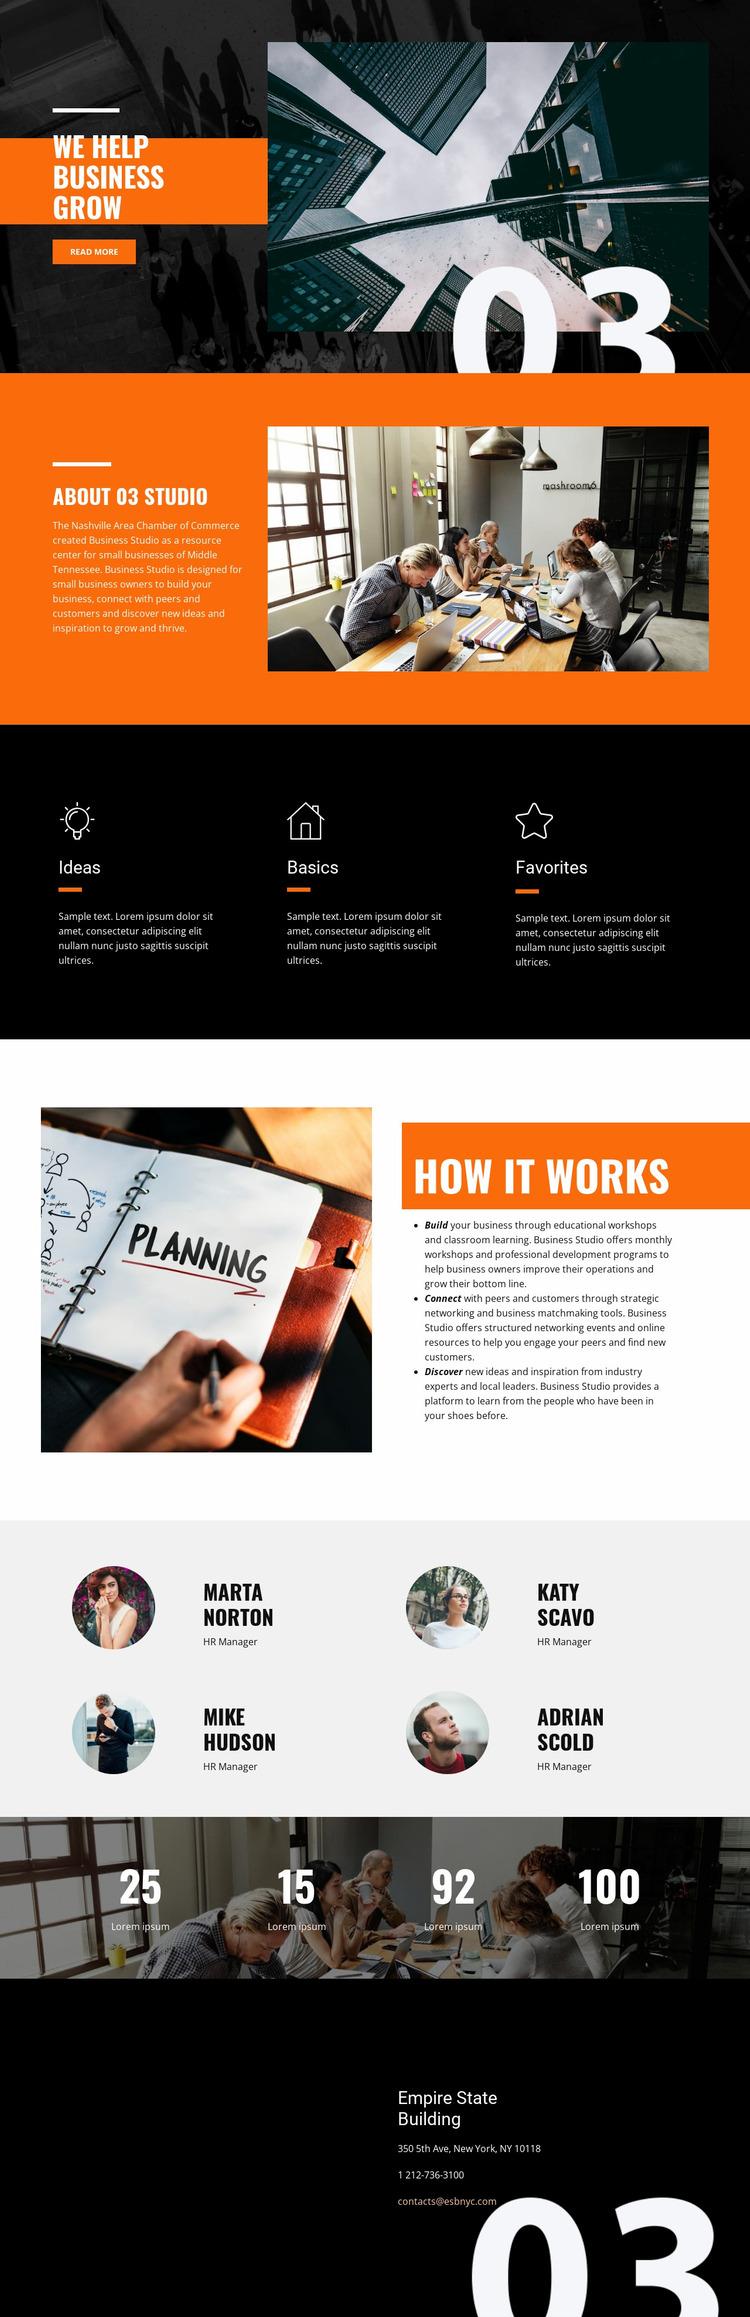 Business Grow Website Mockup